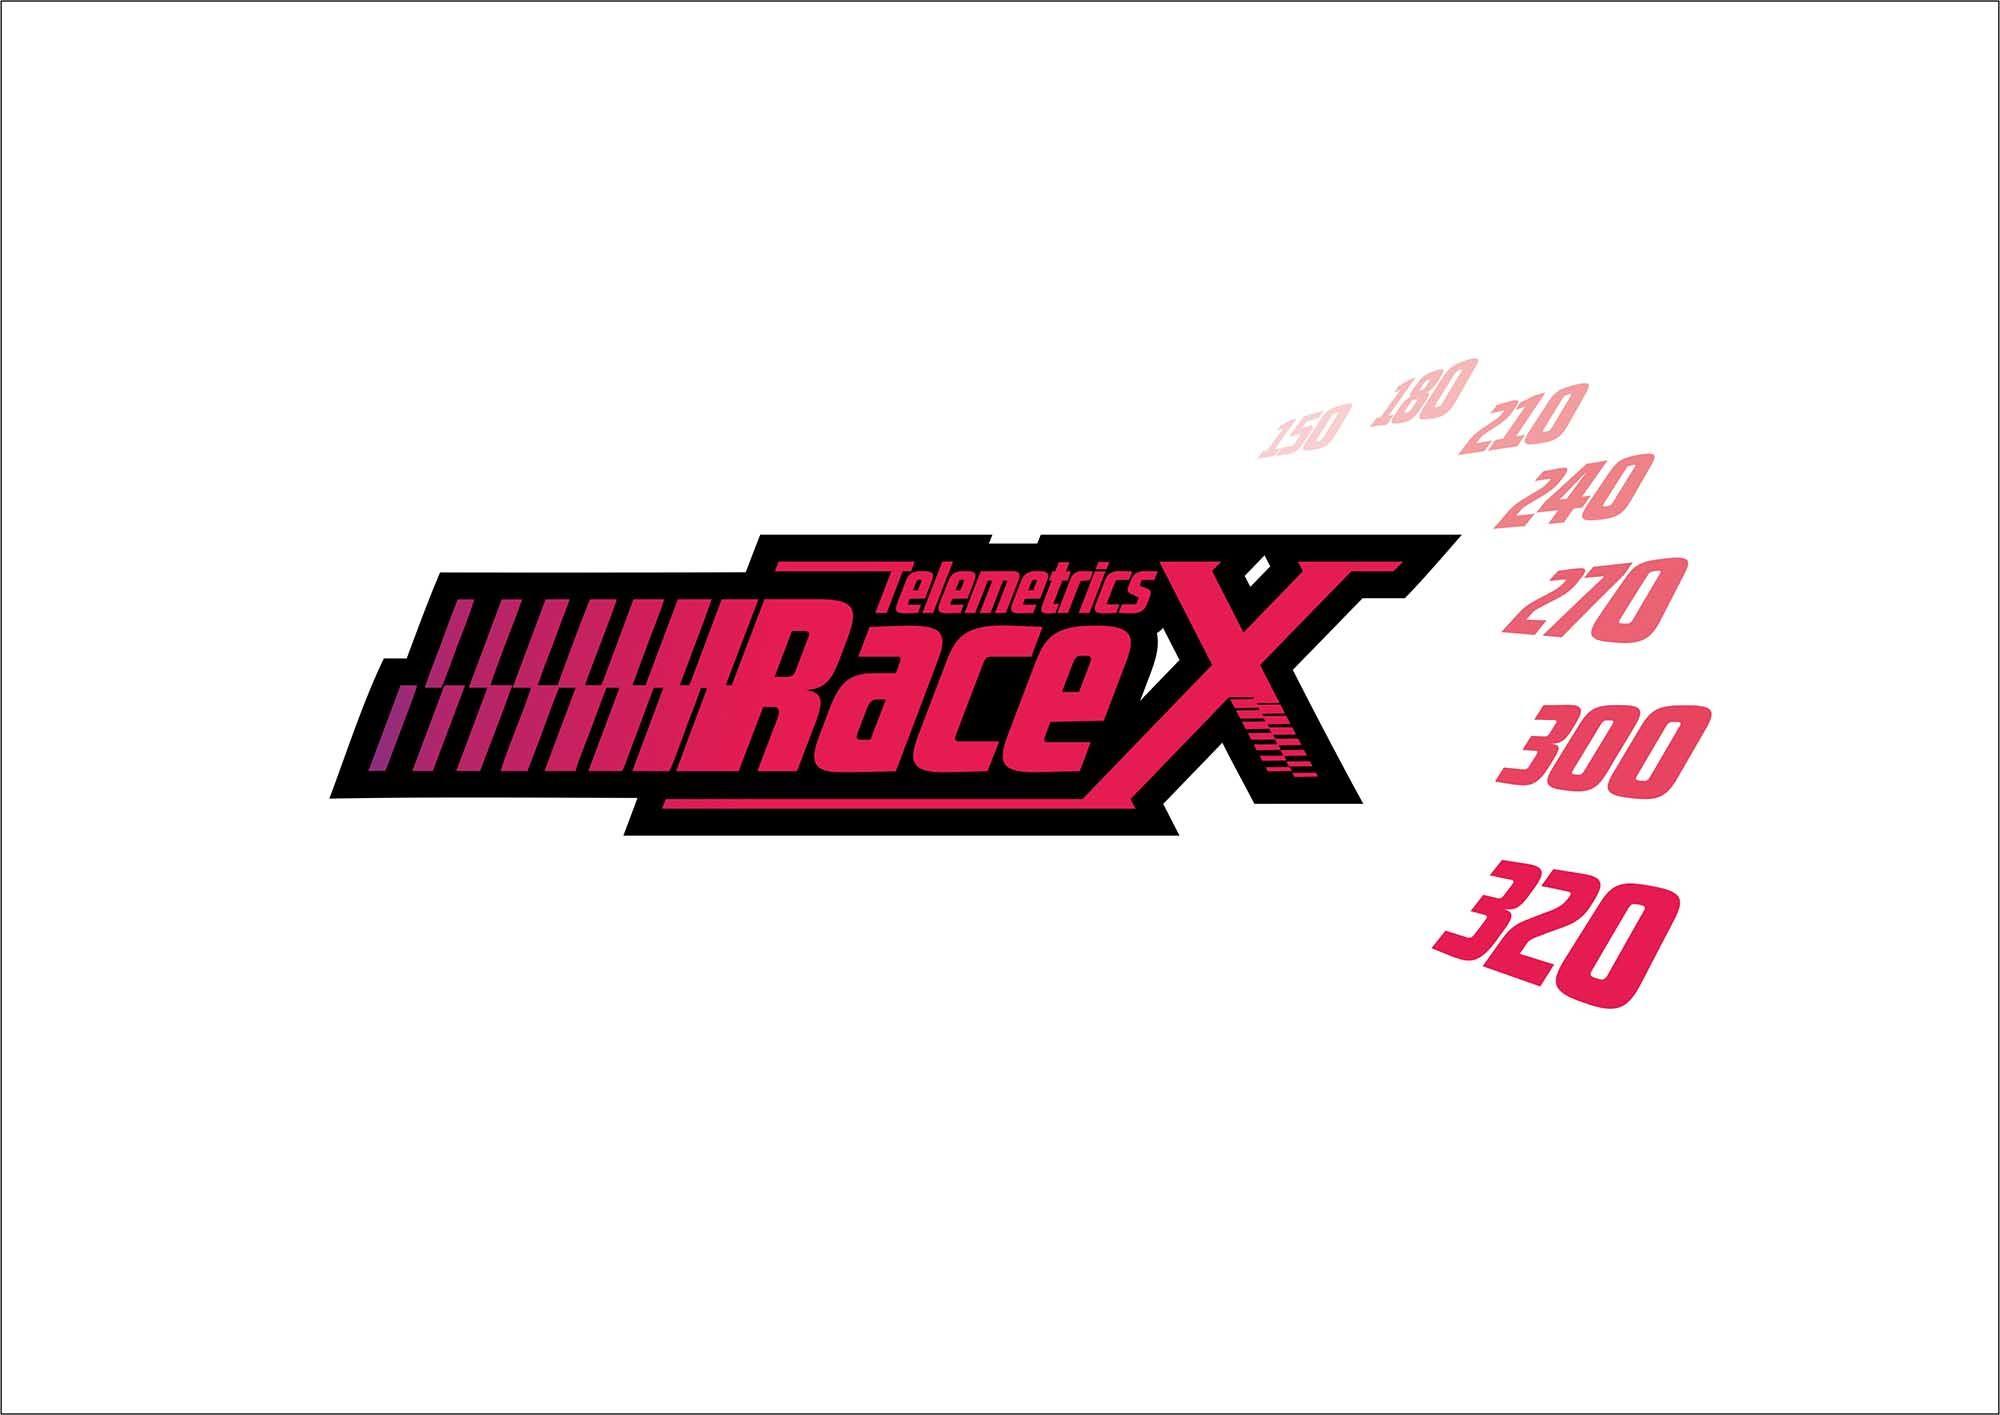 Логотип RaceX Telemetrics  - дизайнер cga-design